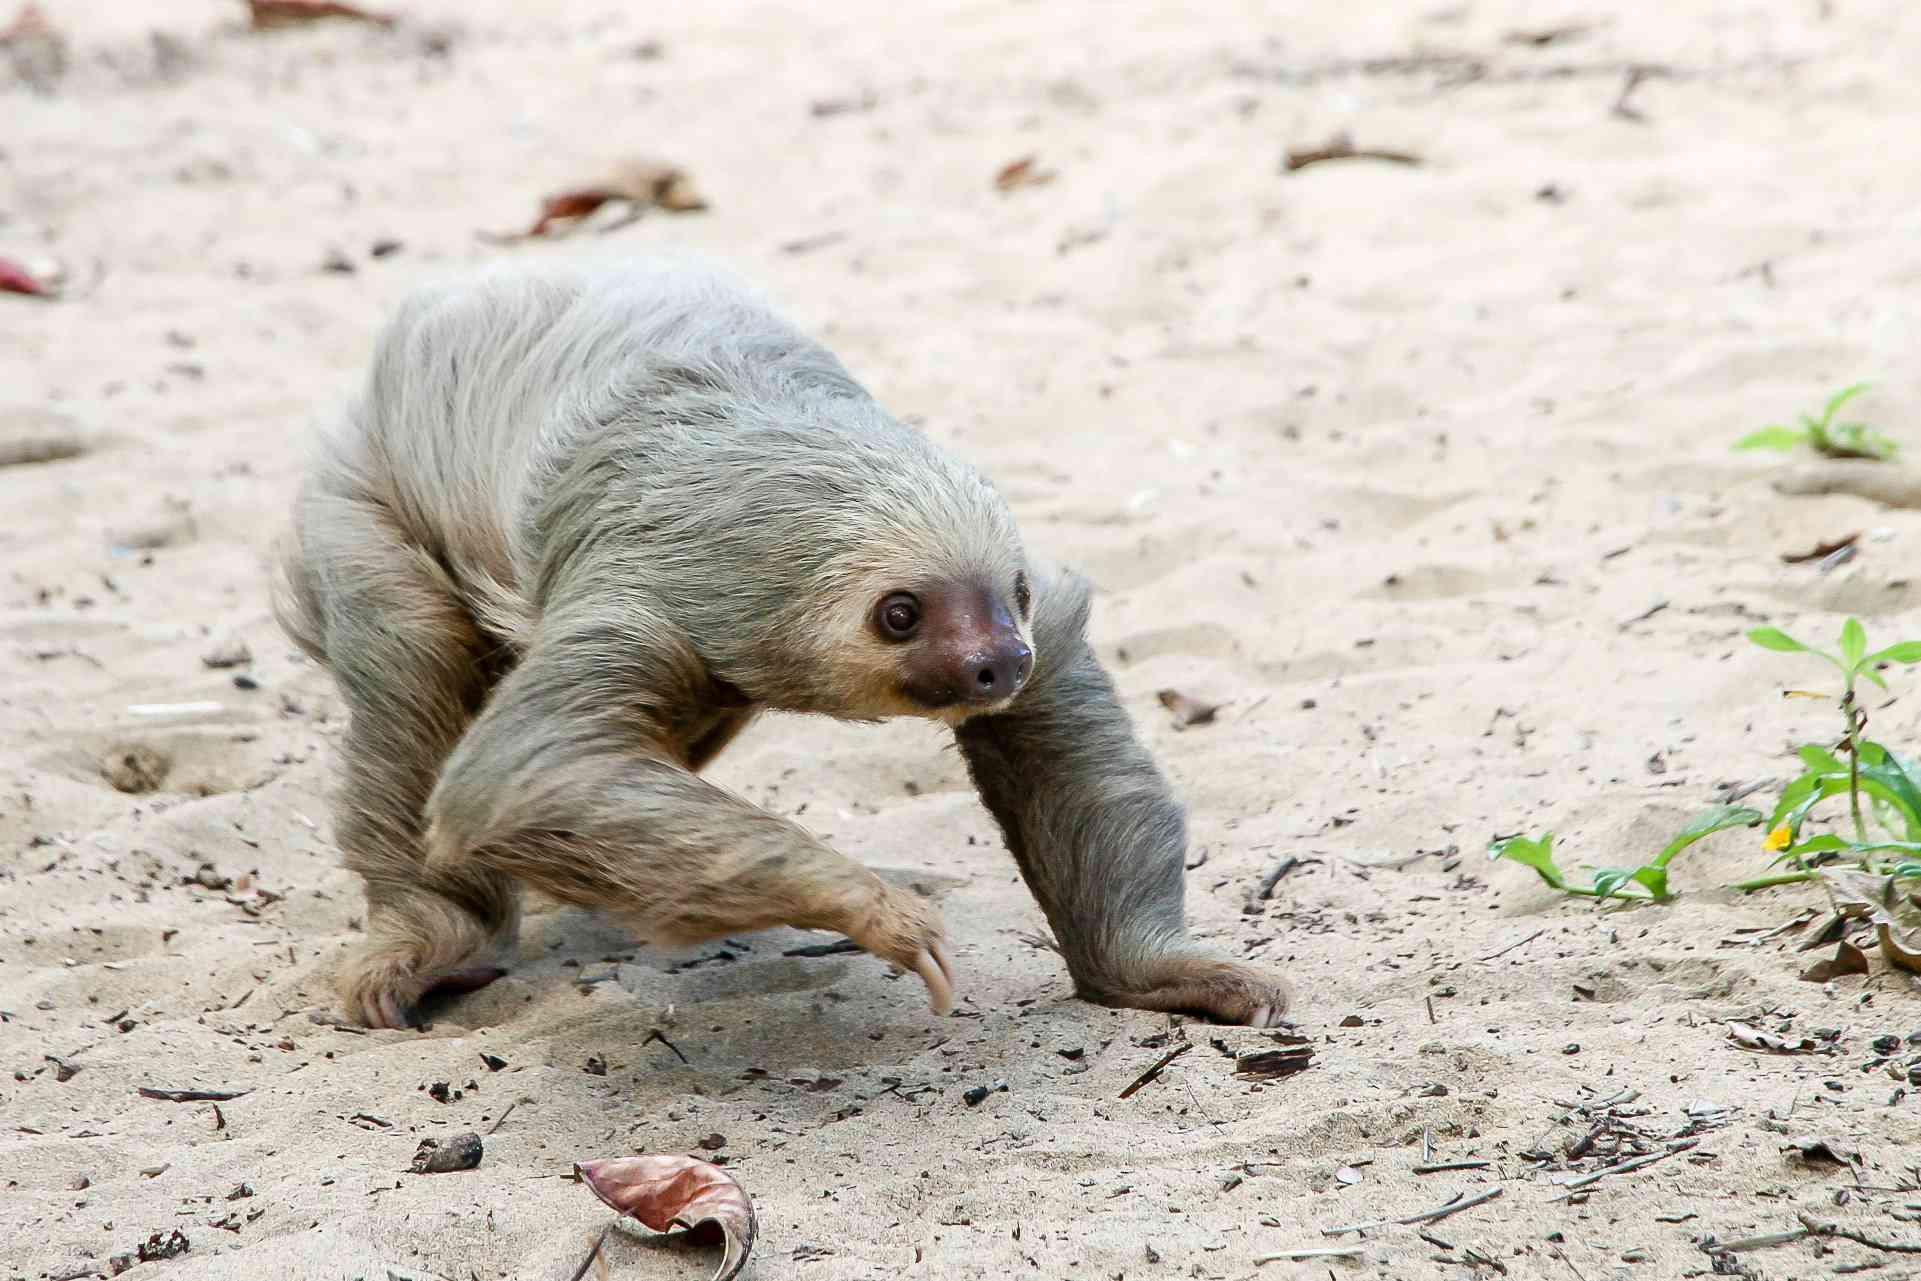 sloth walking on sandy ground